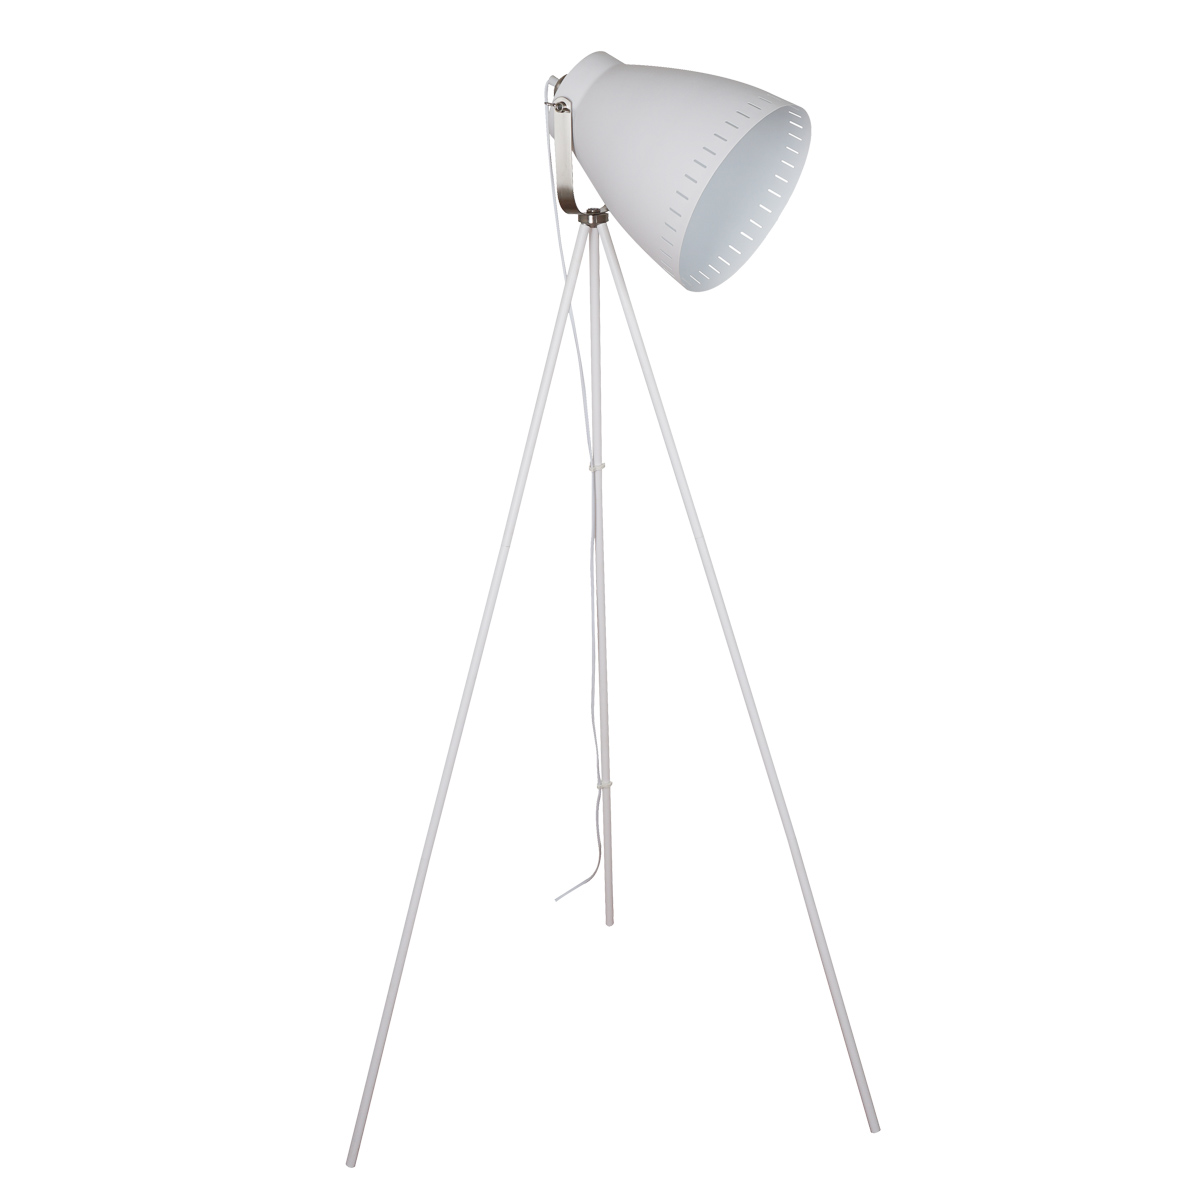 Franklinml Hn3068 Whsnick Lampa Stojąca Retro Italux